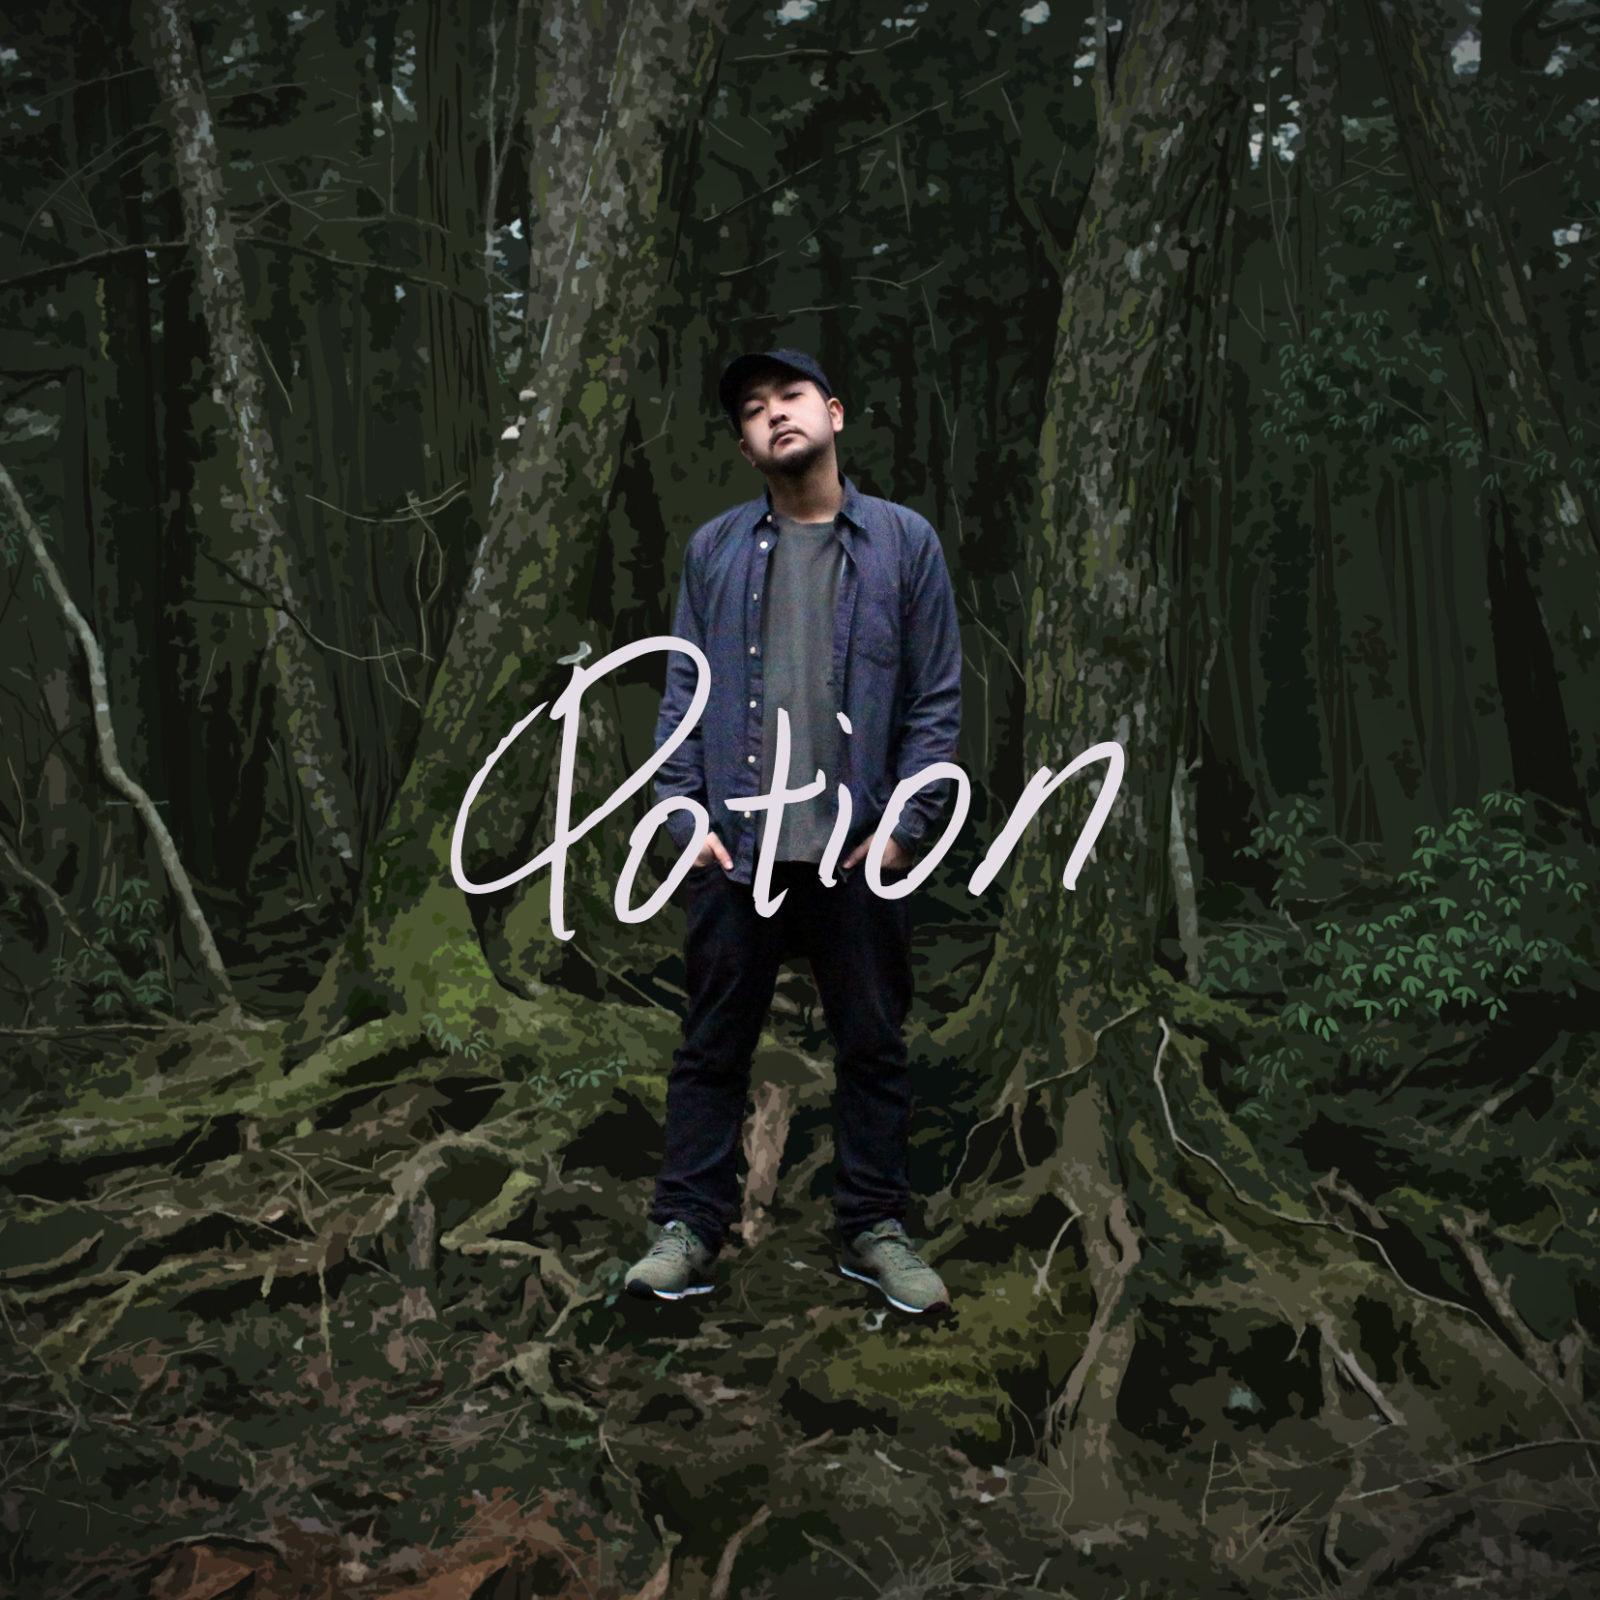 「Potion」 Kz 2,160円(税込)